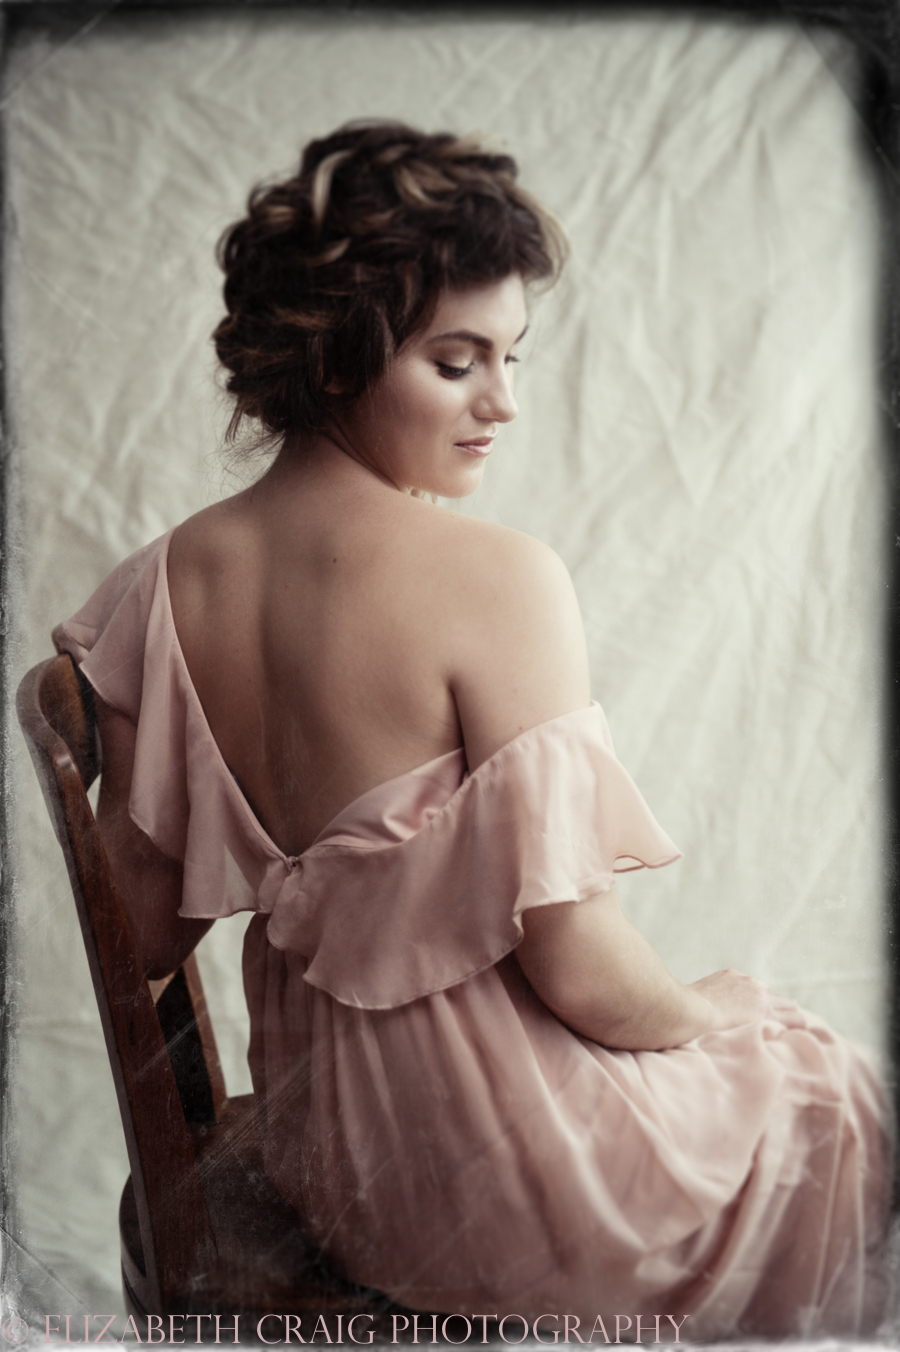 vintage-romantic-boudior-photography-elizabeth-craig-photography-057